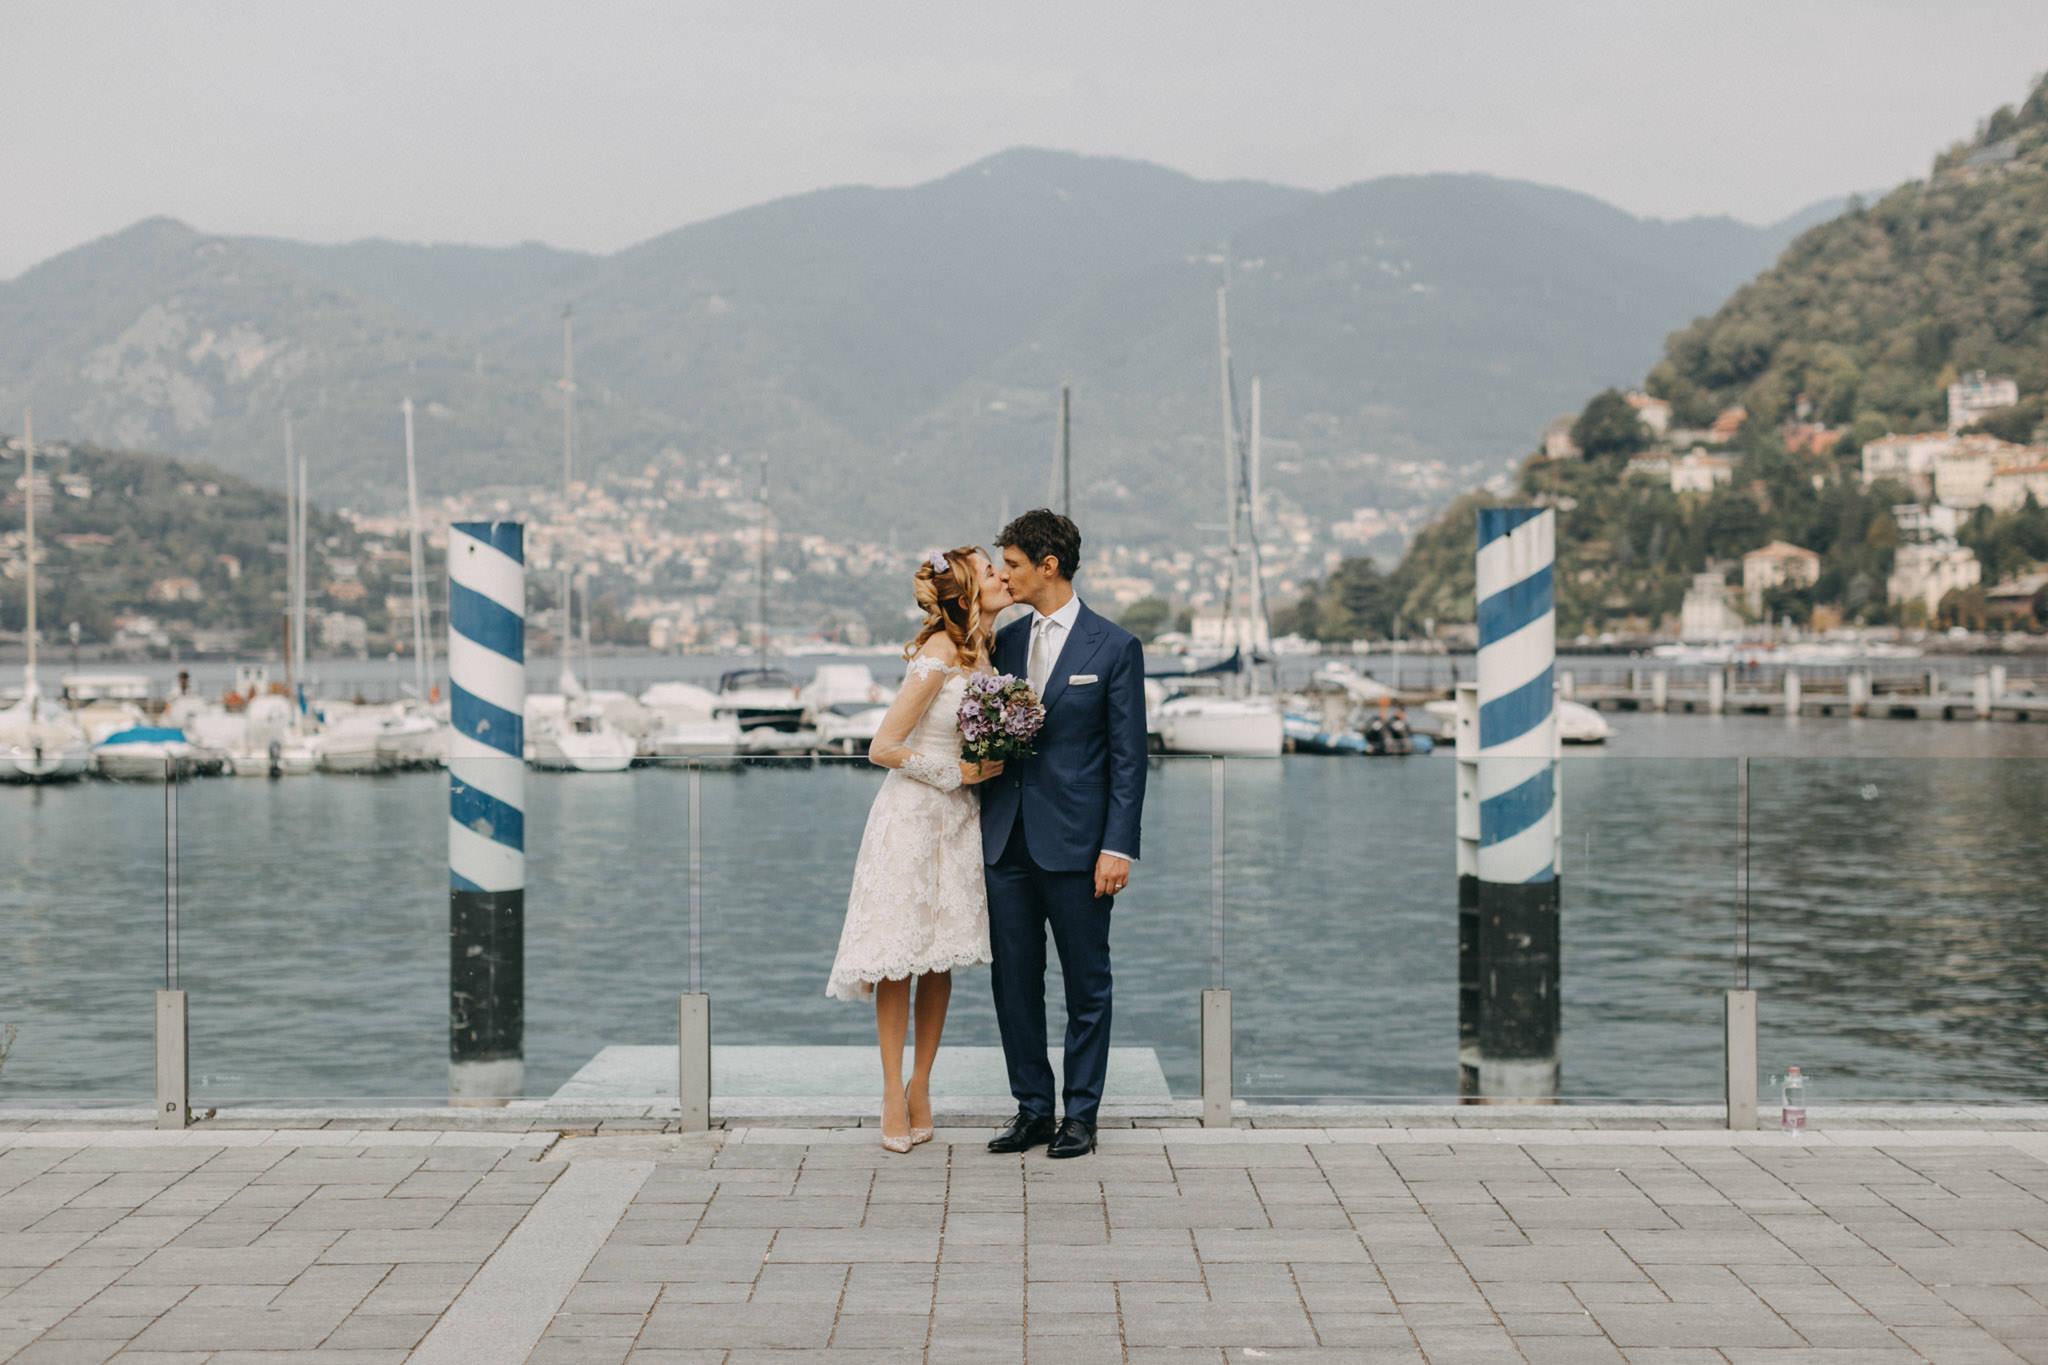 fotografia_di_matrimonio_portfolio-1101